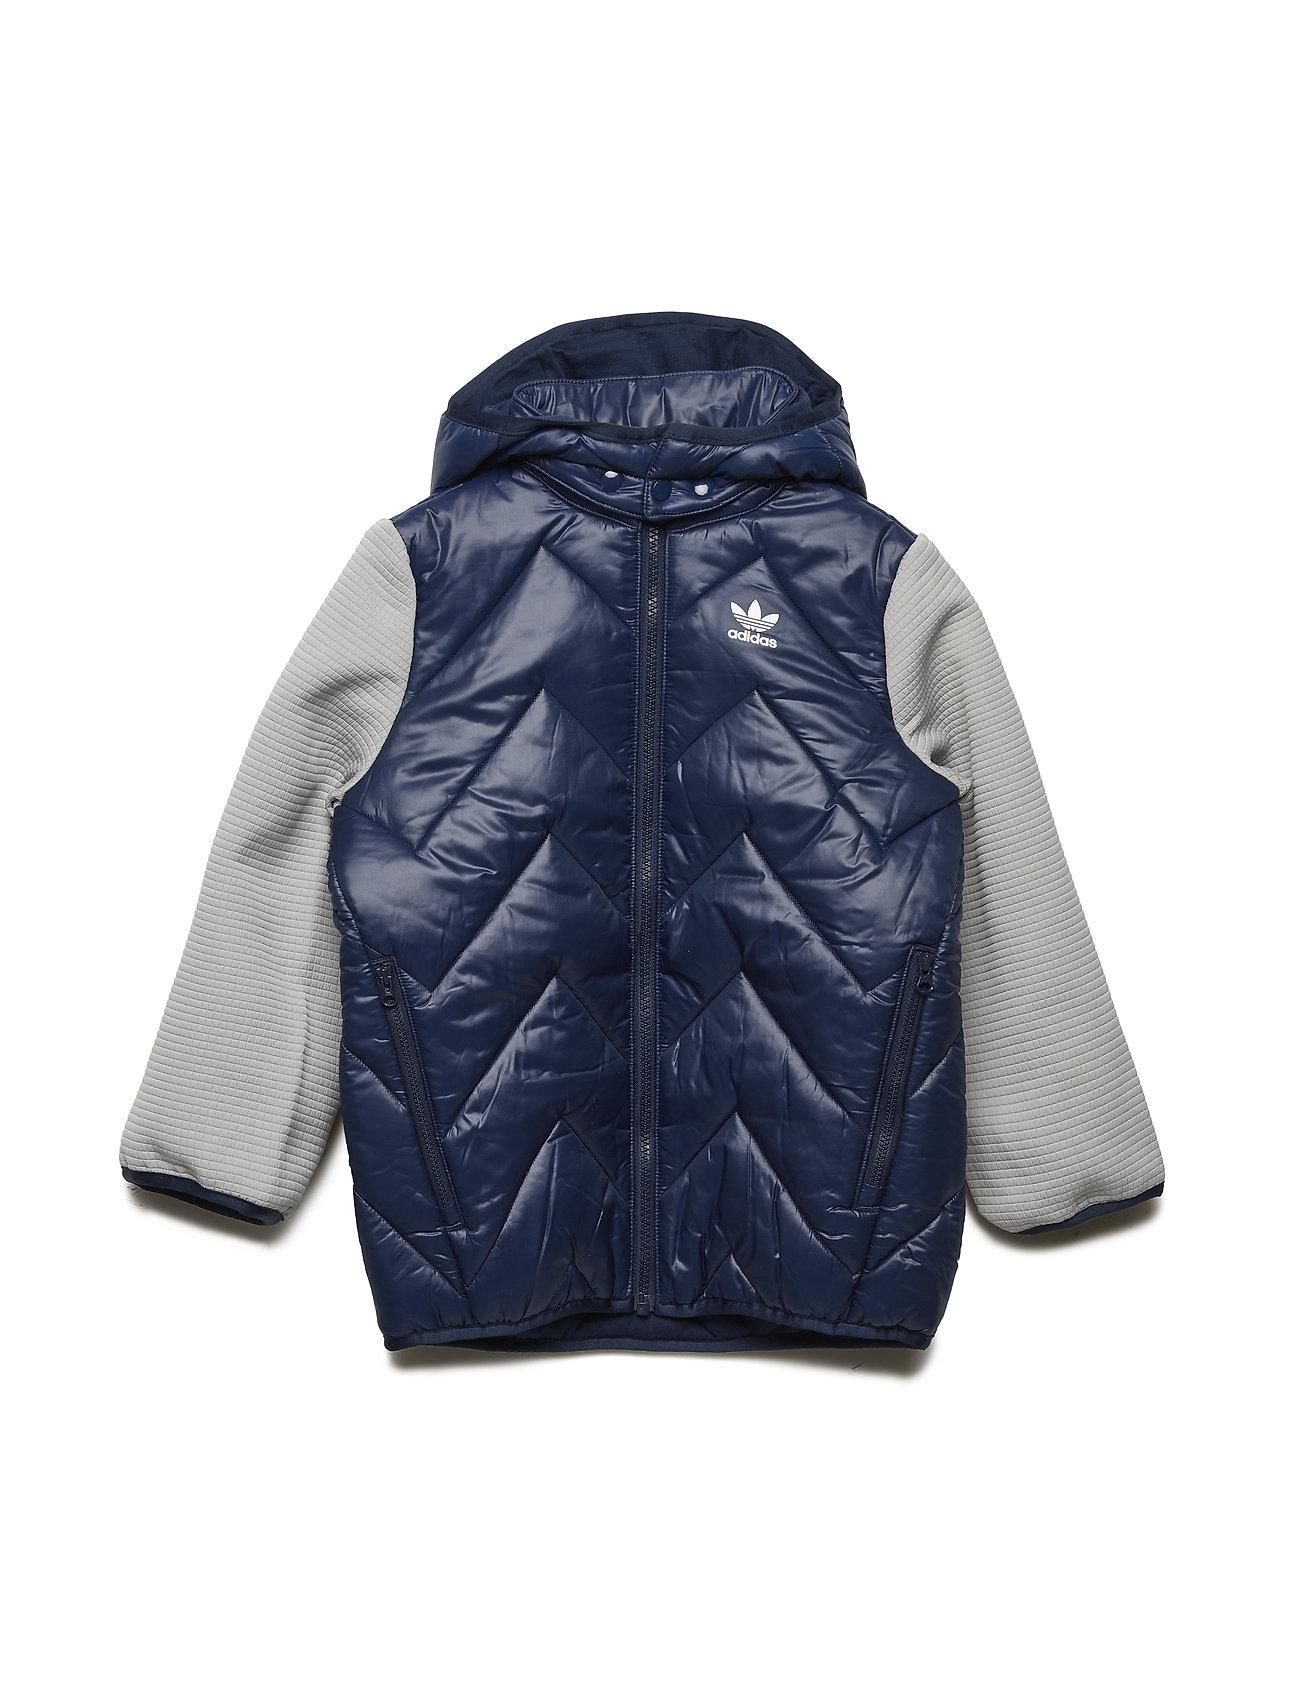 adidas Originals L TRF MS JKT - CONAVY/MGSOGR